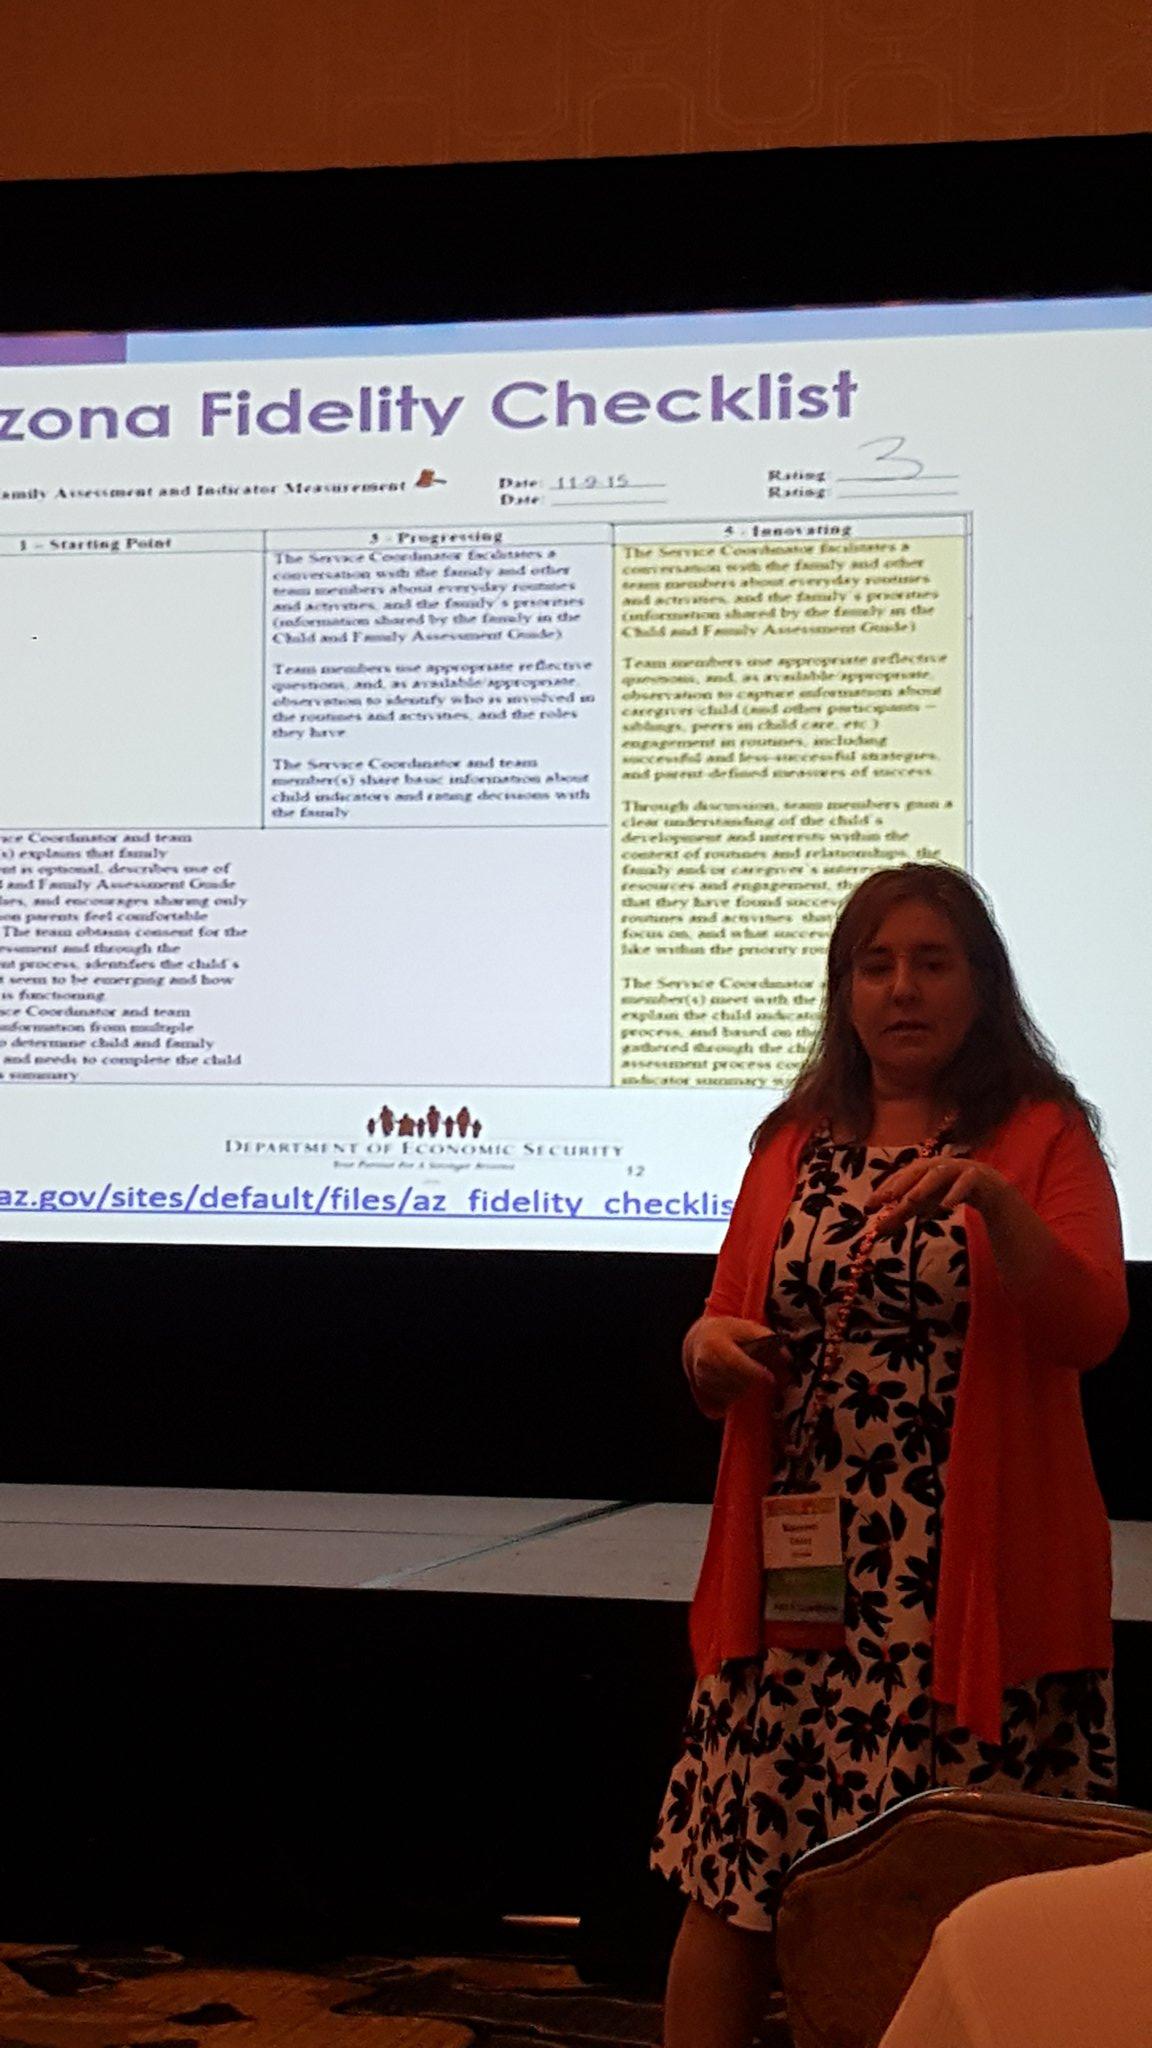 Maureen shares the Arizona Fidelity Checklist. Partnering with families. #ECIDEA16 @DaSyCenter @caseywaid https://t.co/TuBWKDvwNo